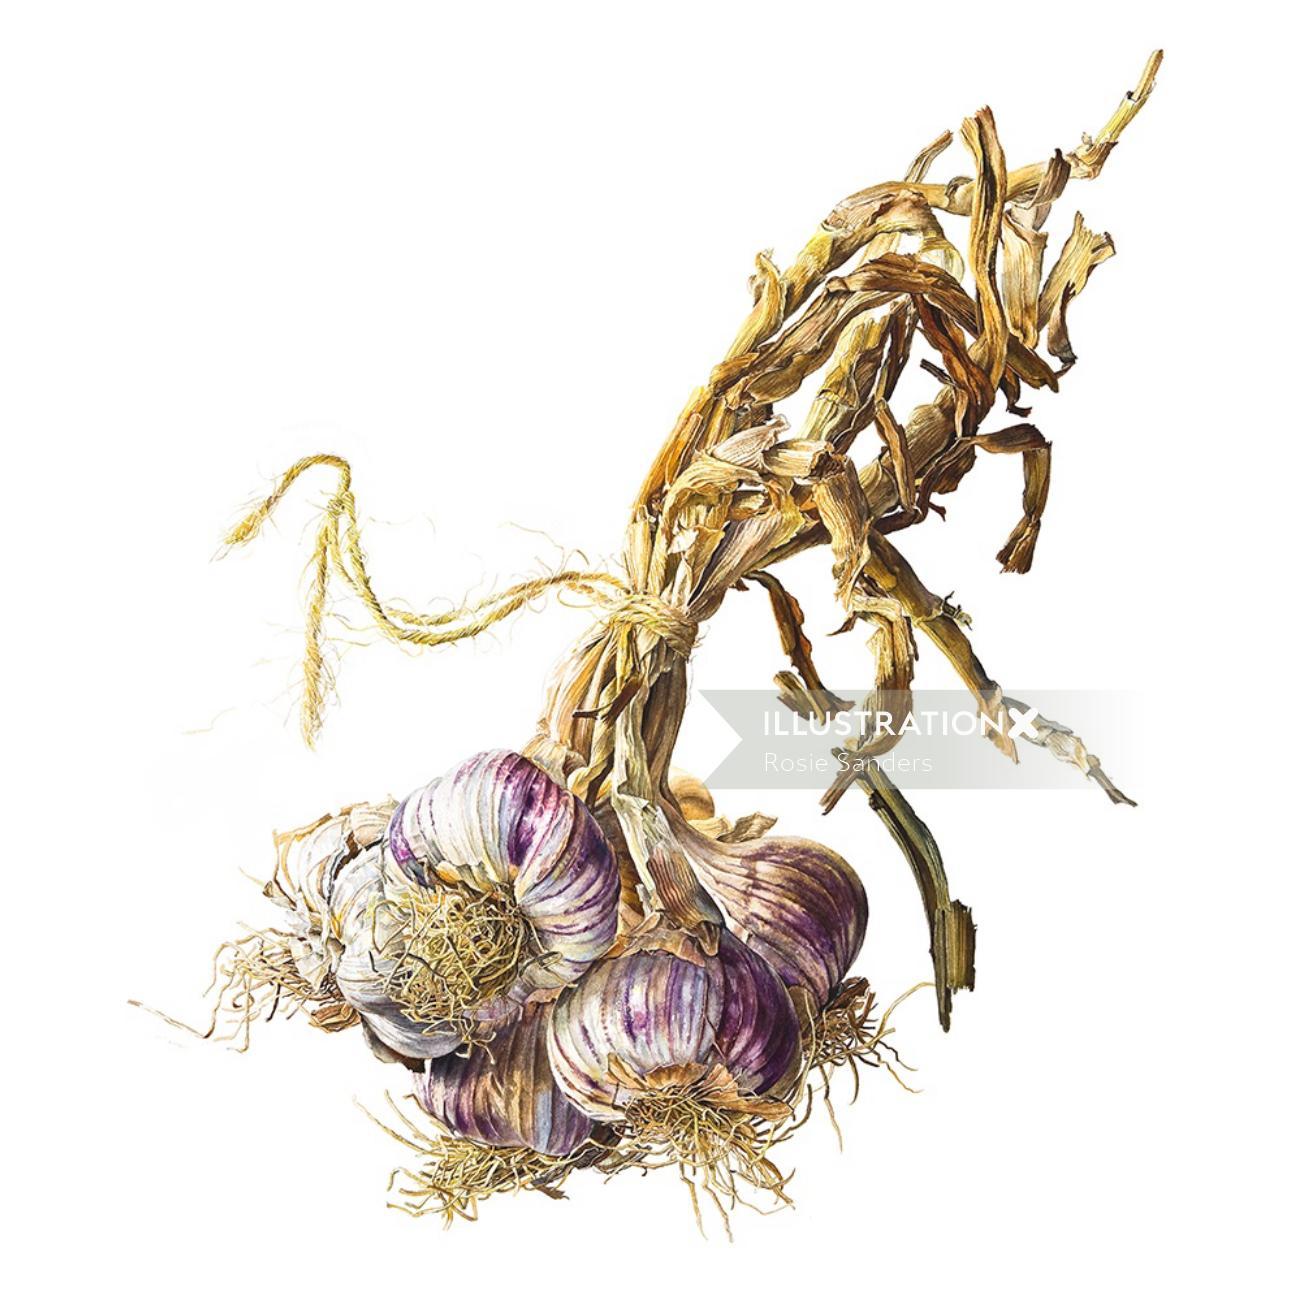 Garlic illustration by Rosie Sanders